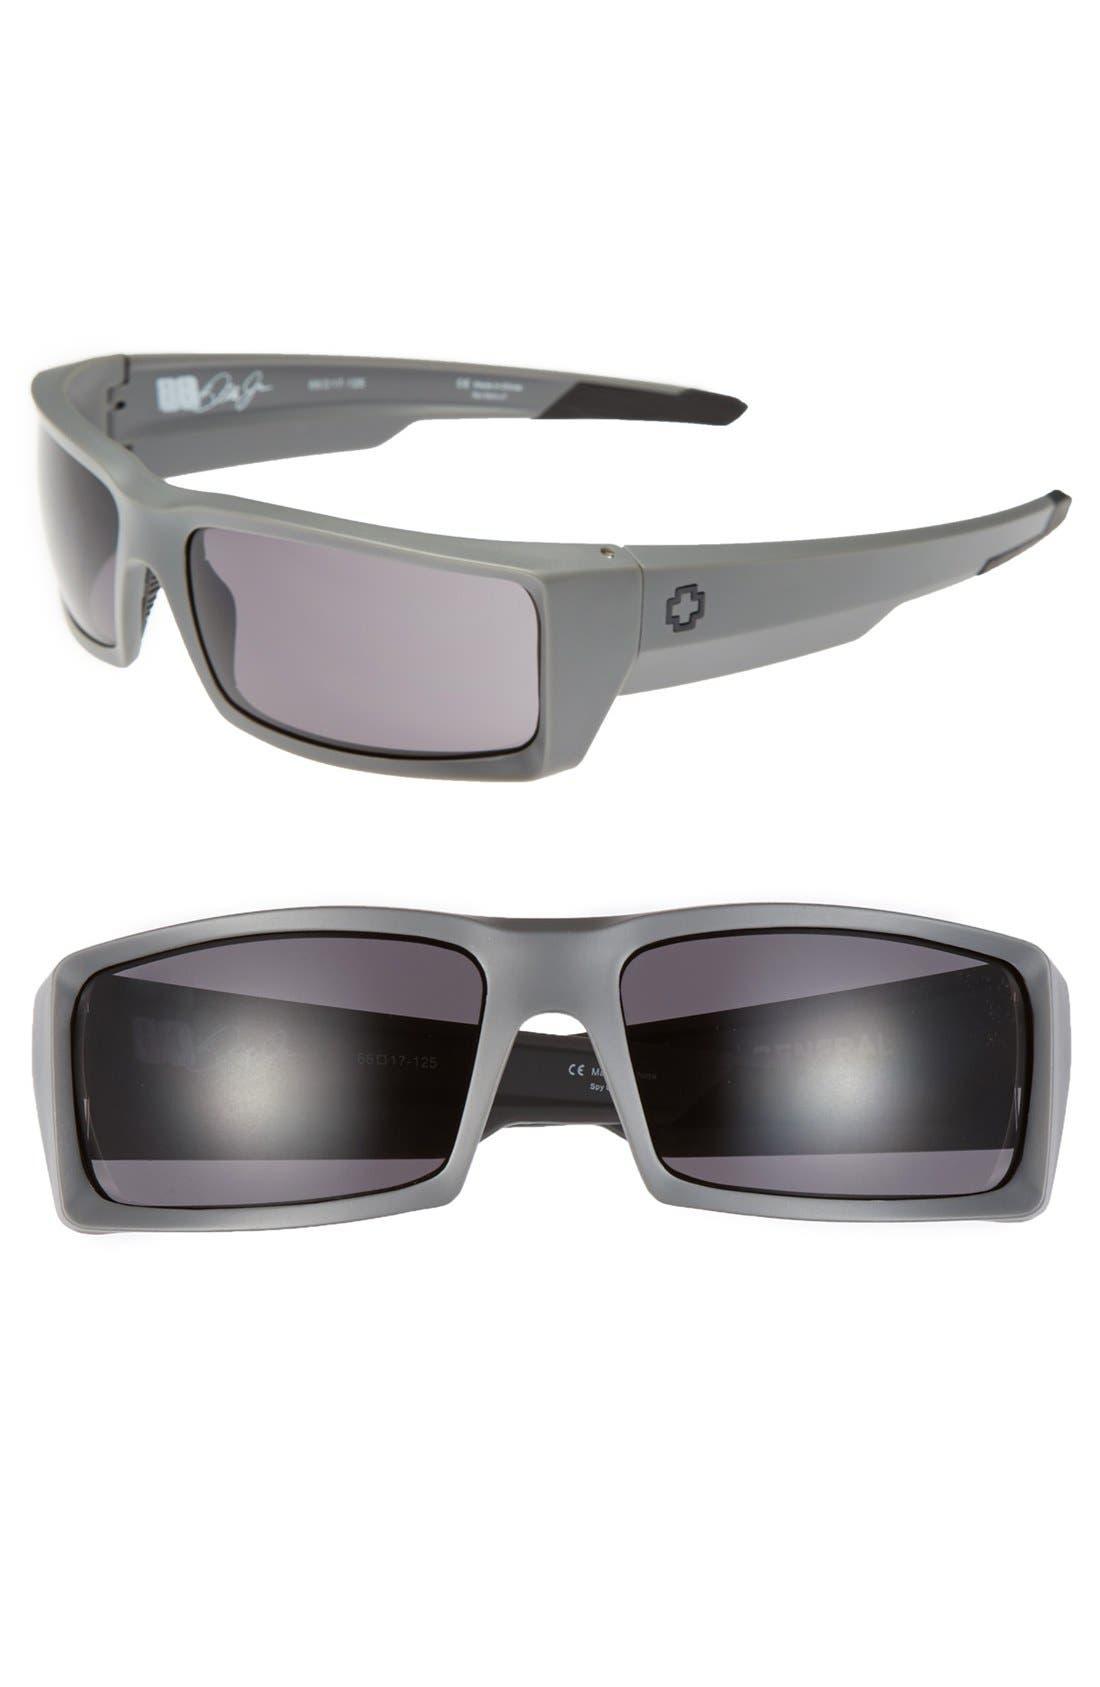 Alternate Image 1 Selected - SPY Optic 'Dale Earnhardt Jr. - General' 66mm Sunglasses